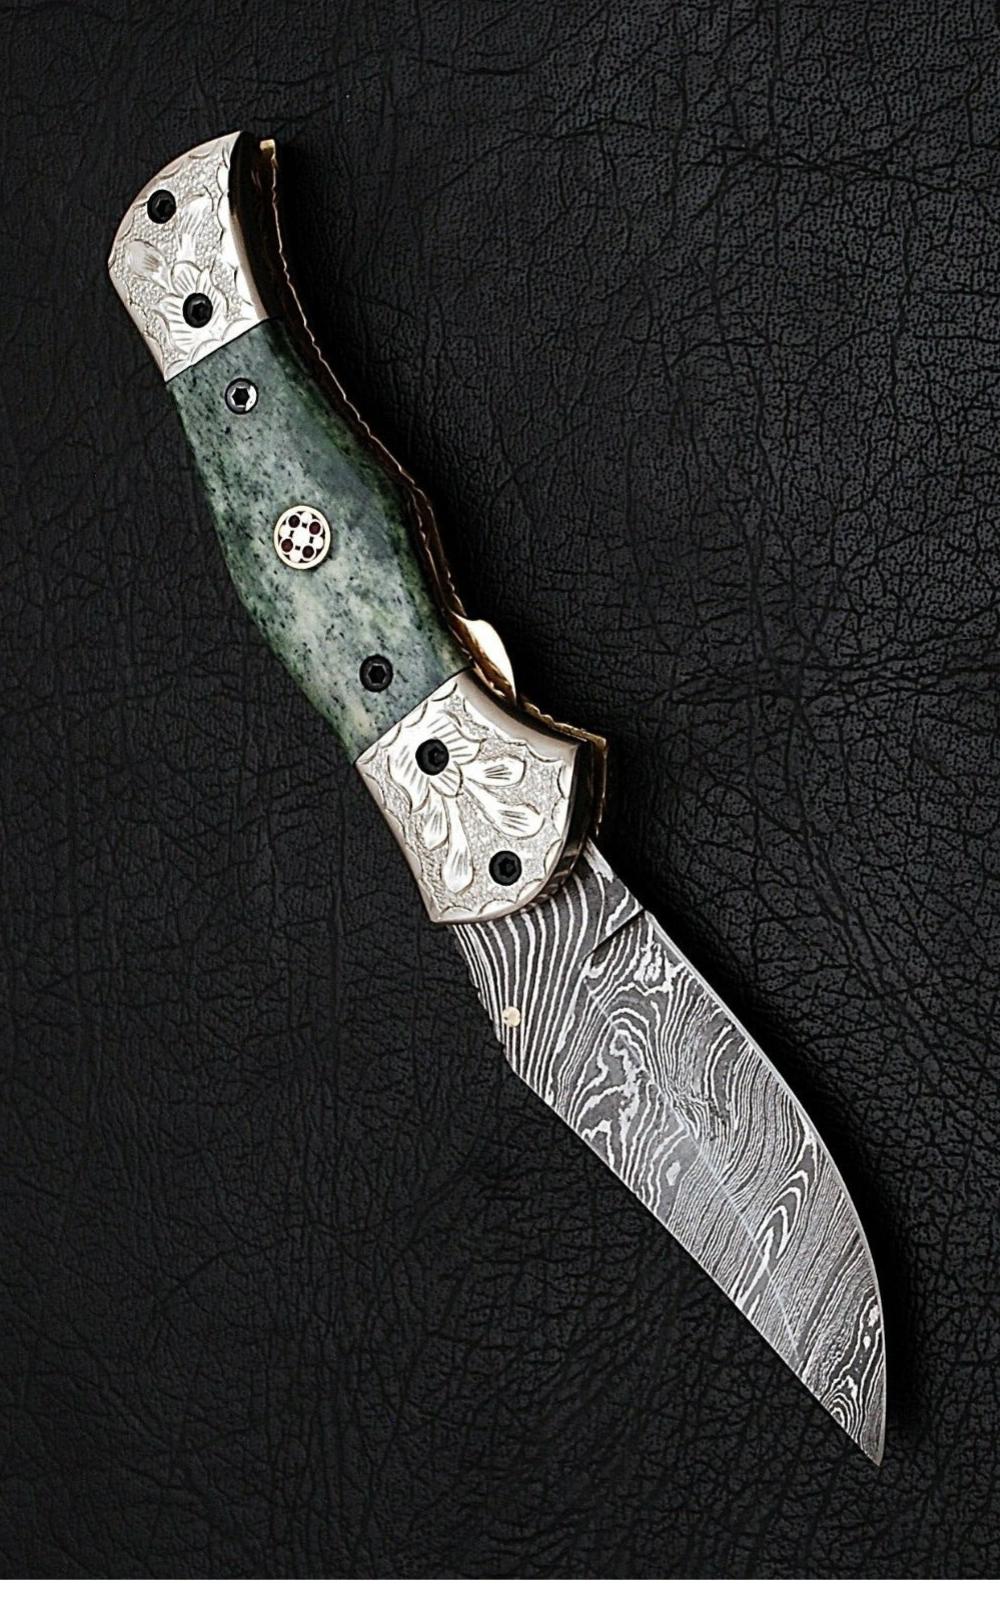 Buy Damascus Steel Knives Online At Scorpion Mart Engraved Pocket Knives Damascus Steel Custom Pocket Knives